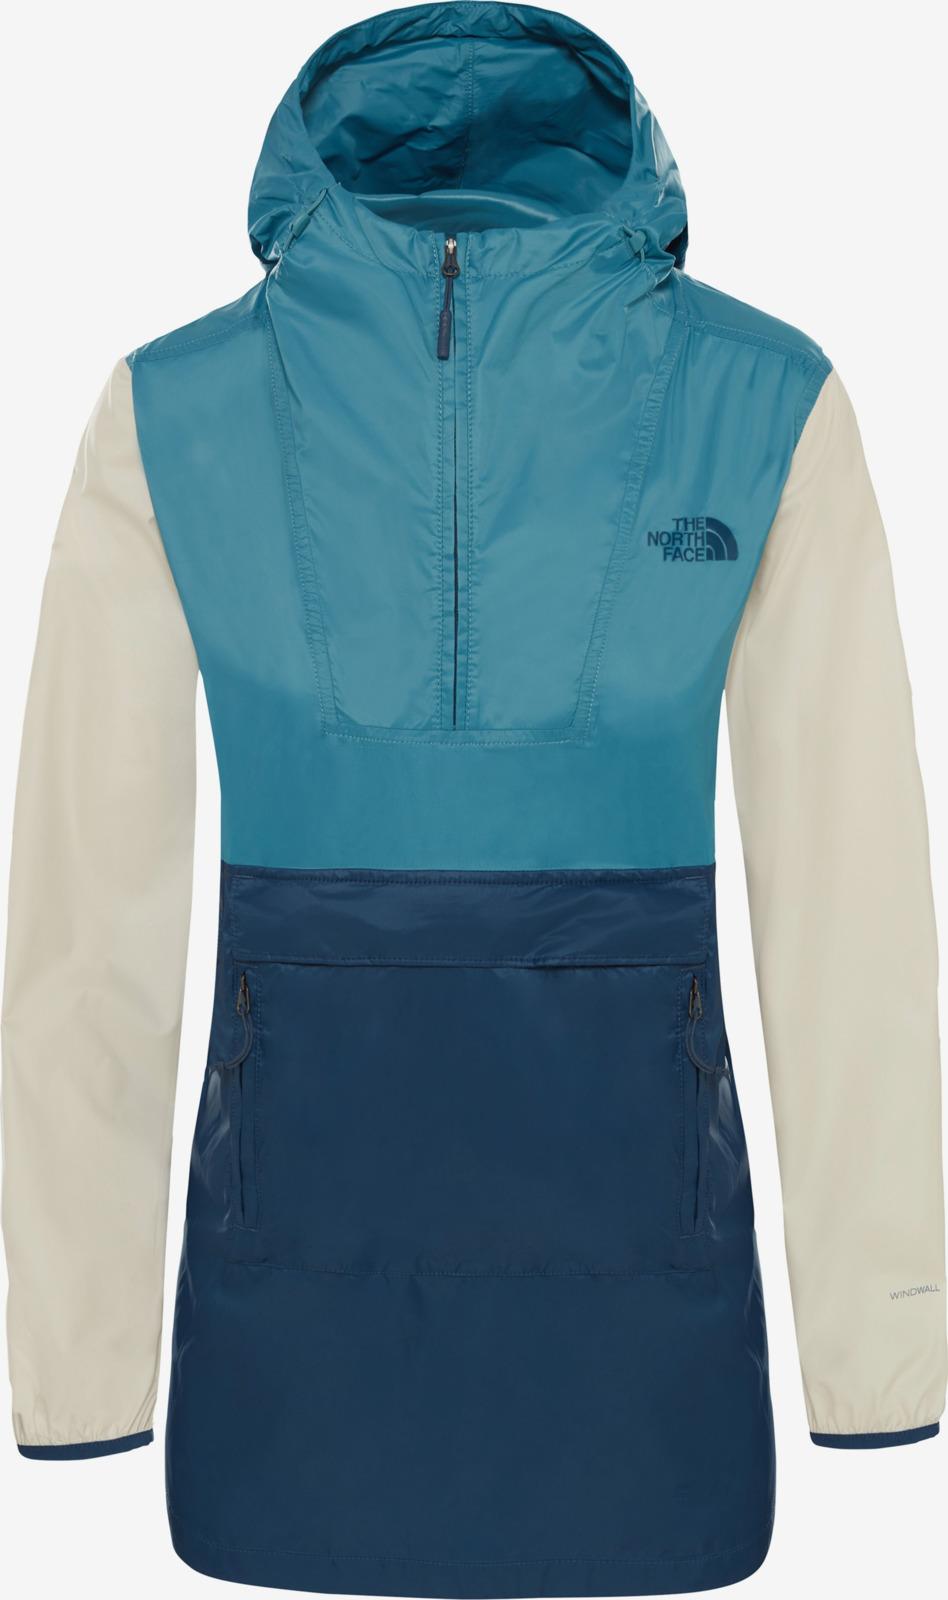 Куртка The North Face Fanorak куртка женская the north face print fanorak цвет бежевый t93sx39hp размер l 48 50